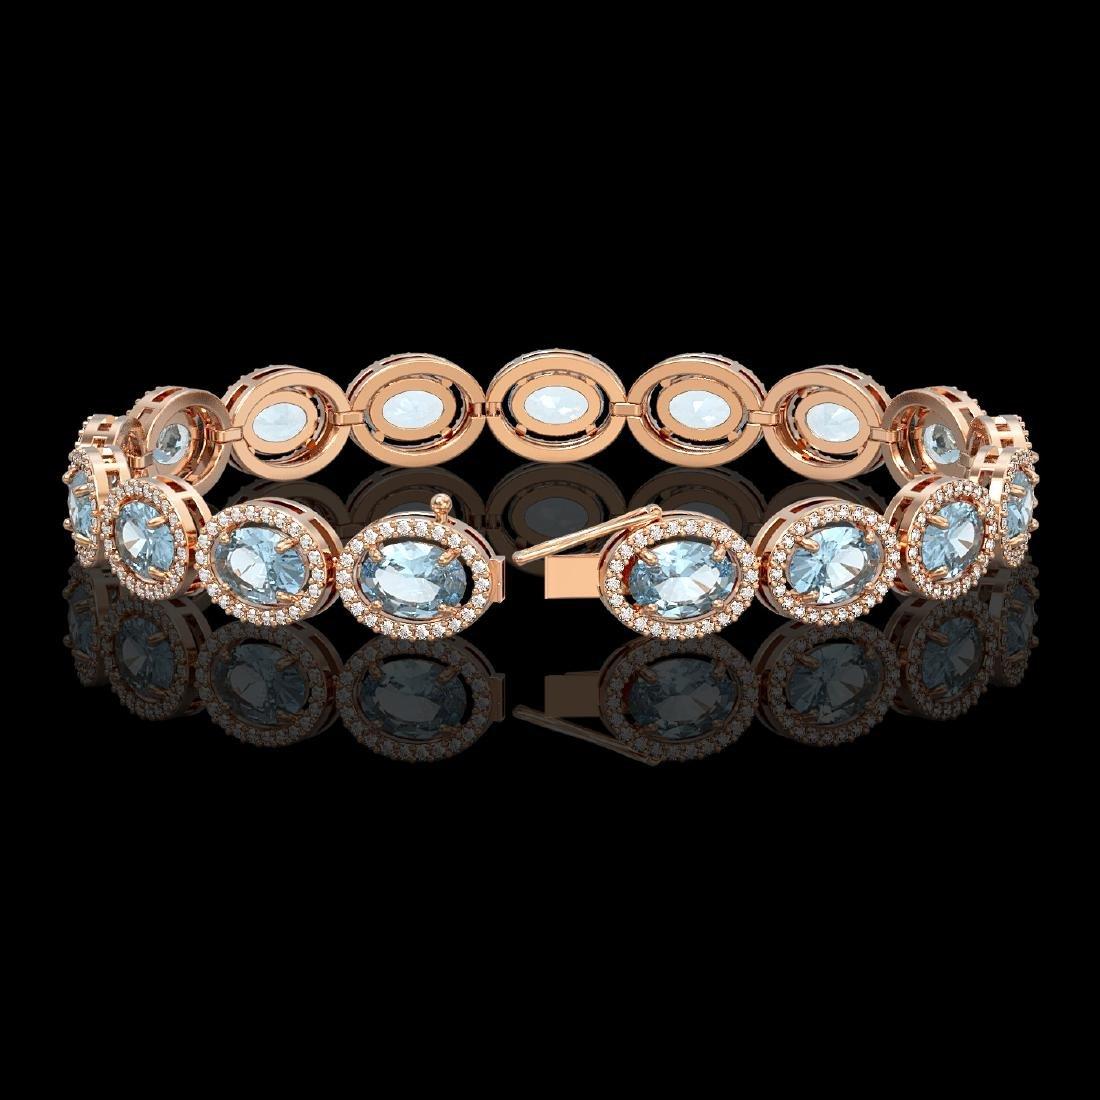 24.32 CTW Sky Topaz & Diamond Halo Bracelet 10K Rose - 2